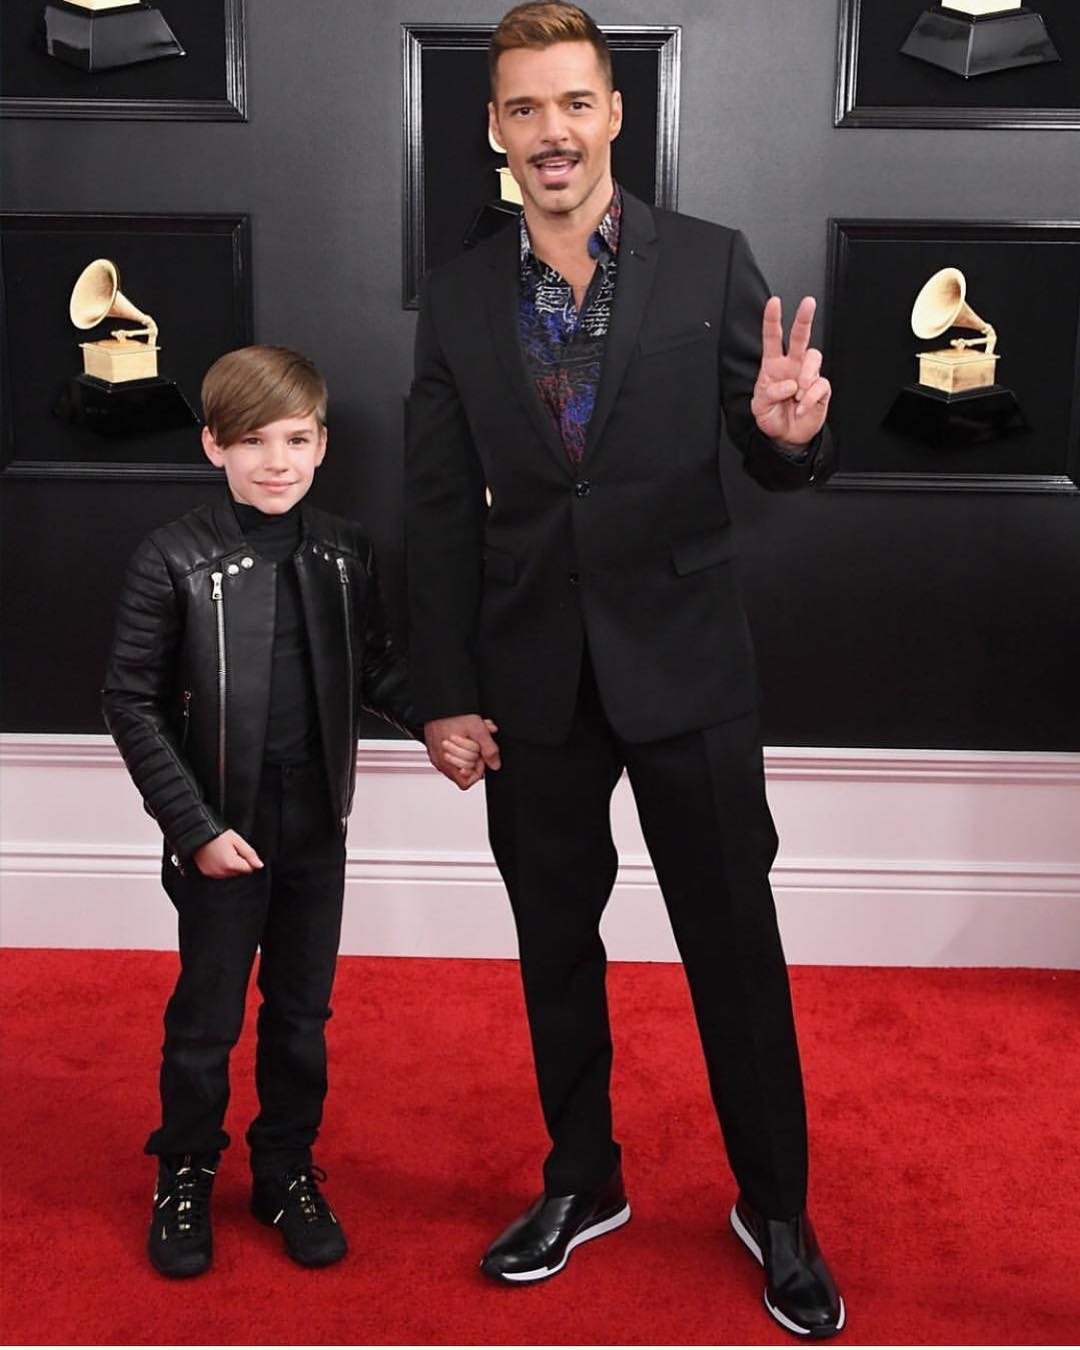 Ricky Martin, Grammys, mustache, Matteo